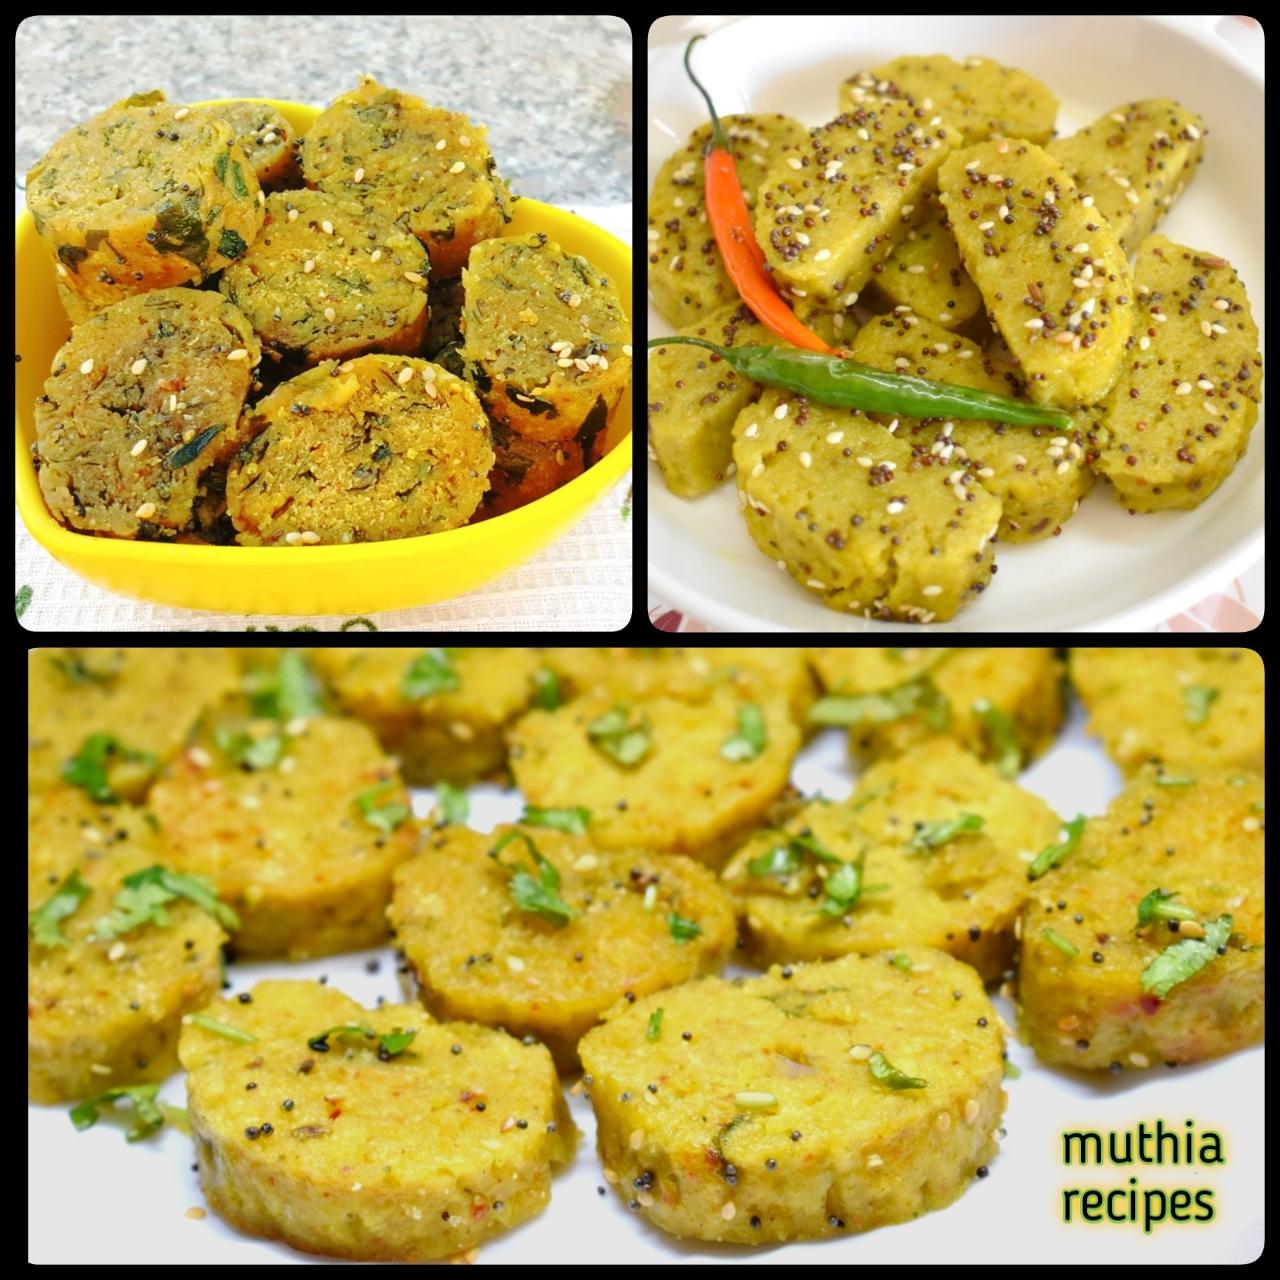 muthia recipes